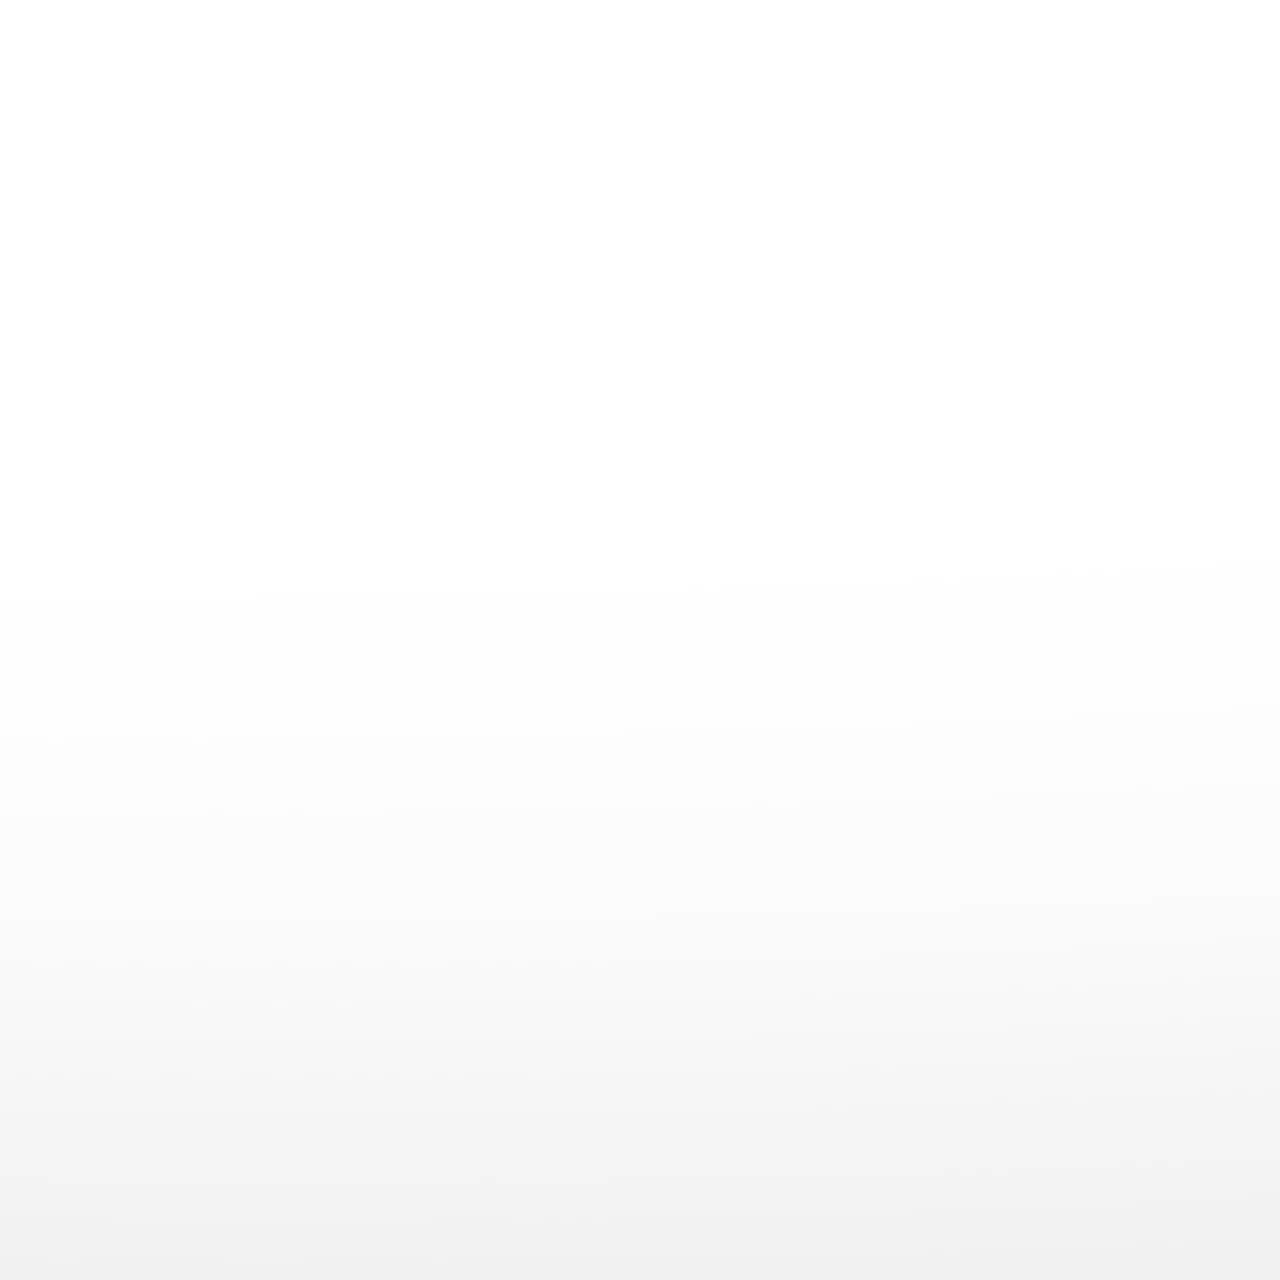 2jz, Supra, Toyota, automobile, car, celica, celicasupra, celicaxx, drift, fastandfurious, ft1, japan, japanese, jdm, jz, racecar, rwd, turbo, v16x, w58, Evolution of the Toyota Supra  GIFs